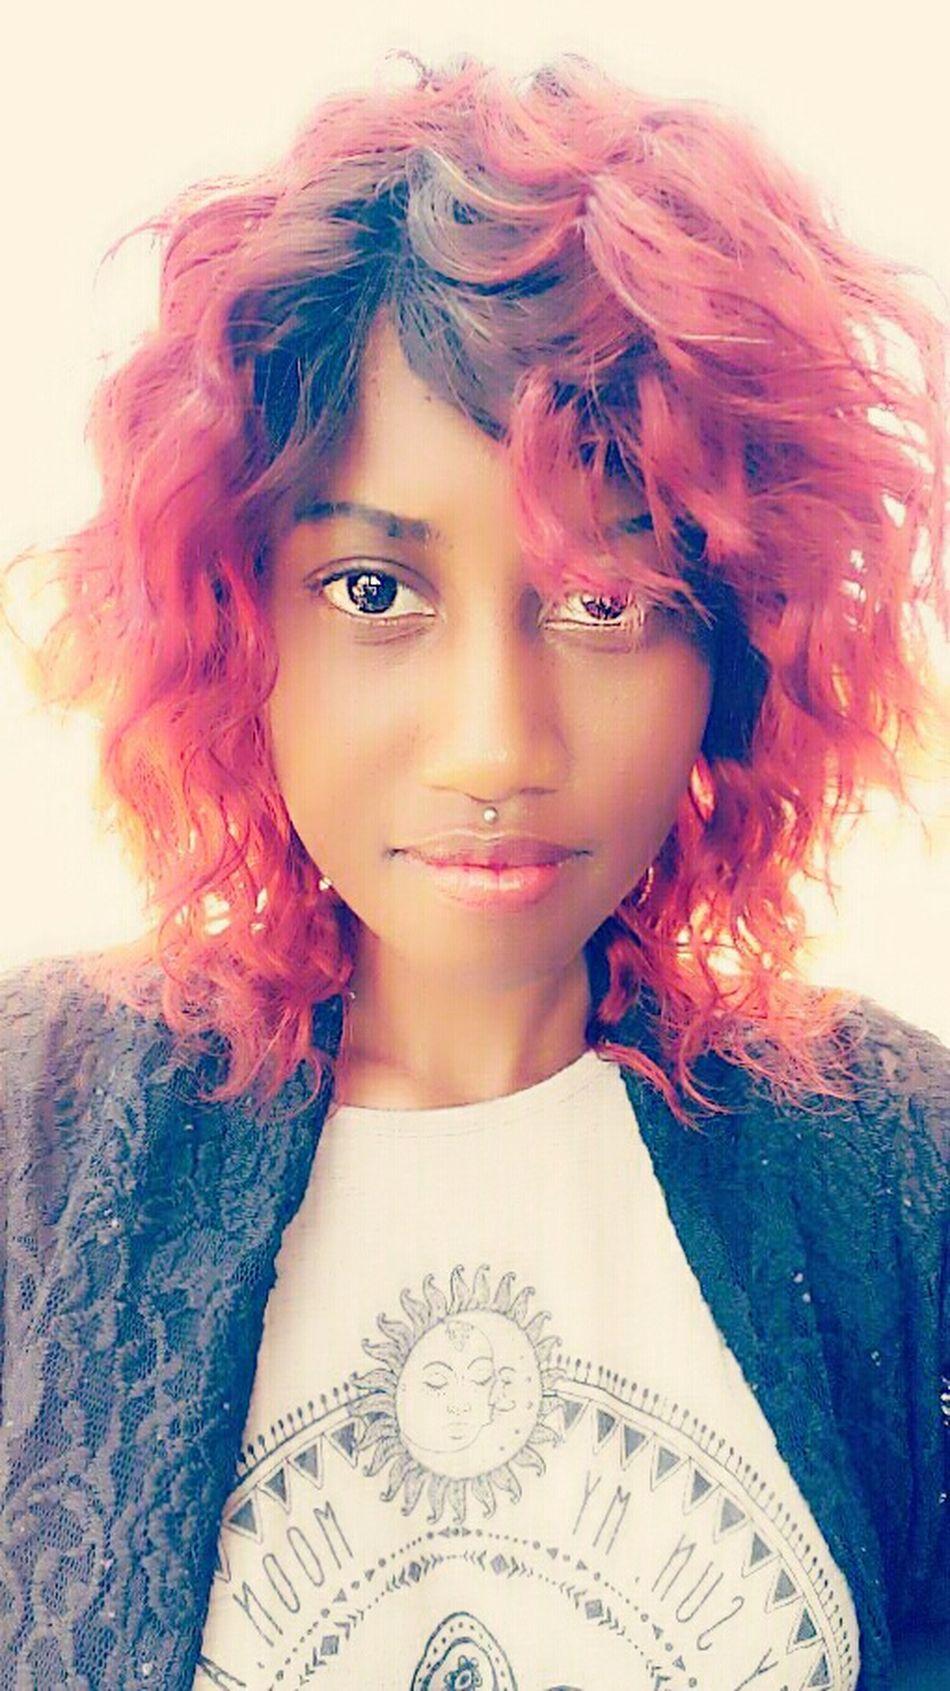 Loveandpeace Flowerchild Realwoman Pink Hippylife Beautiful Day Beginnings